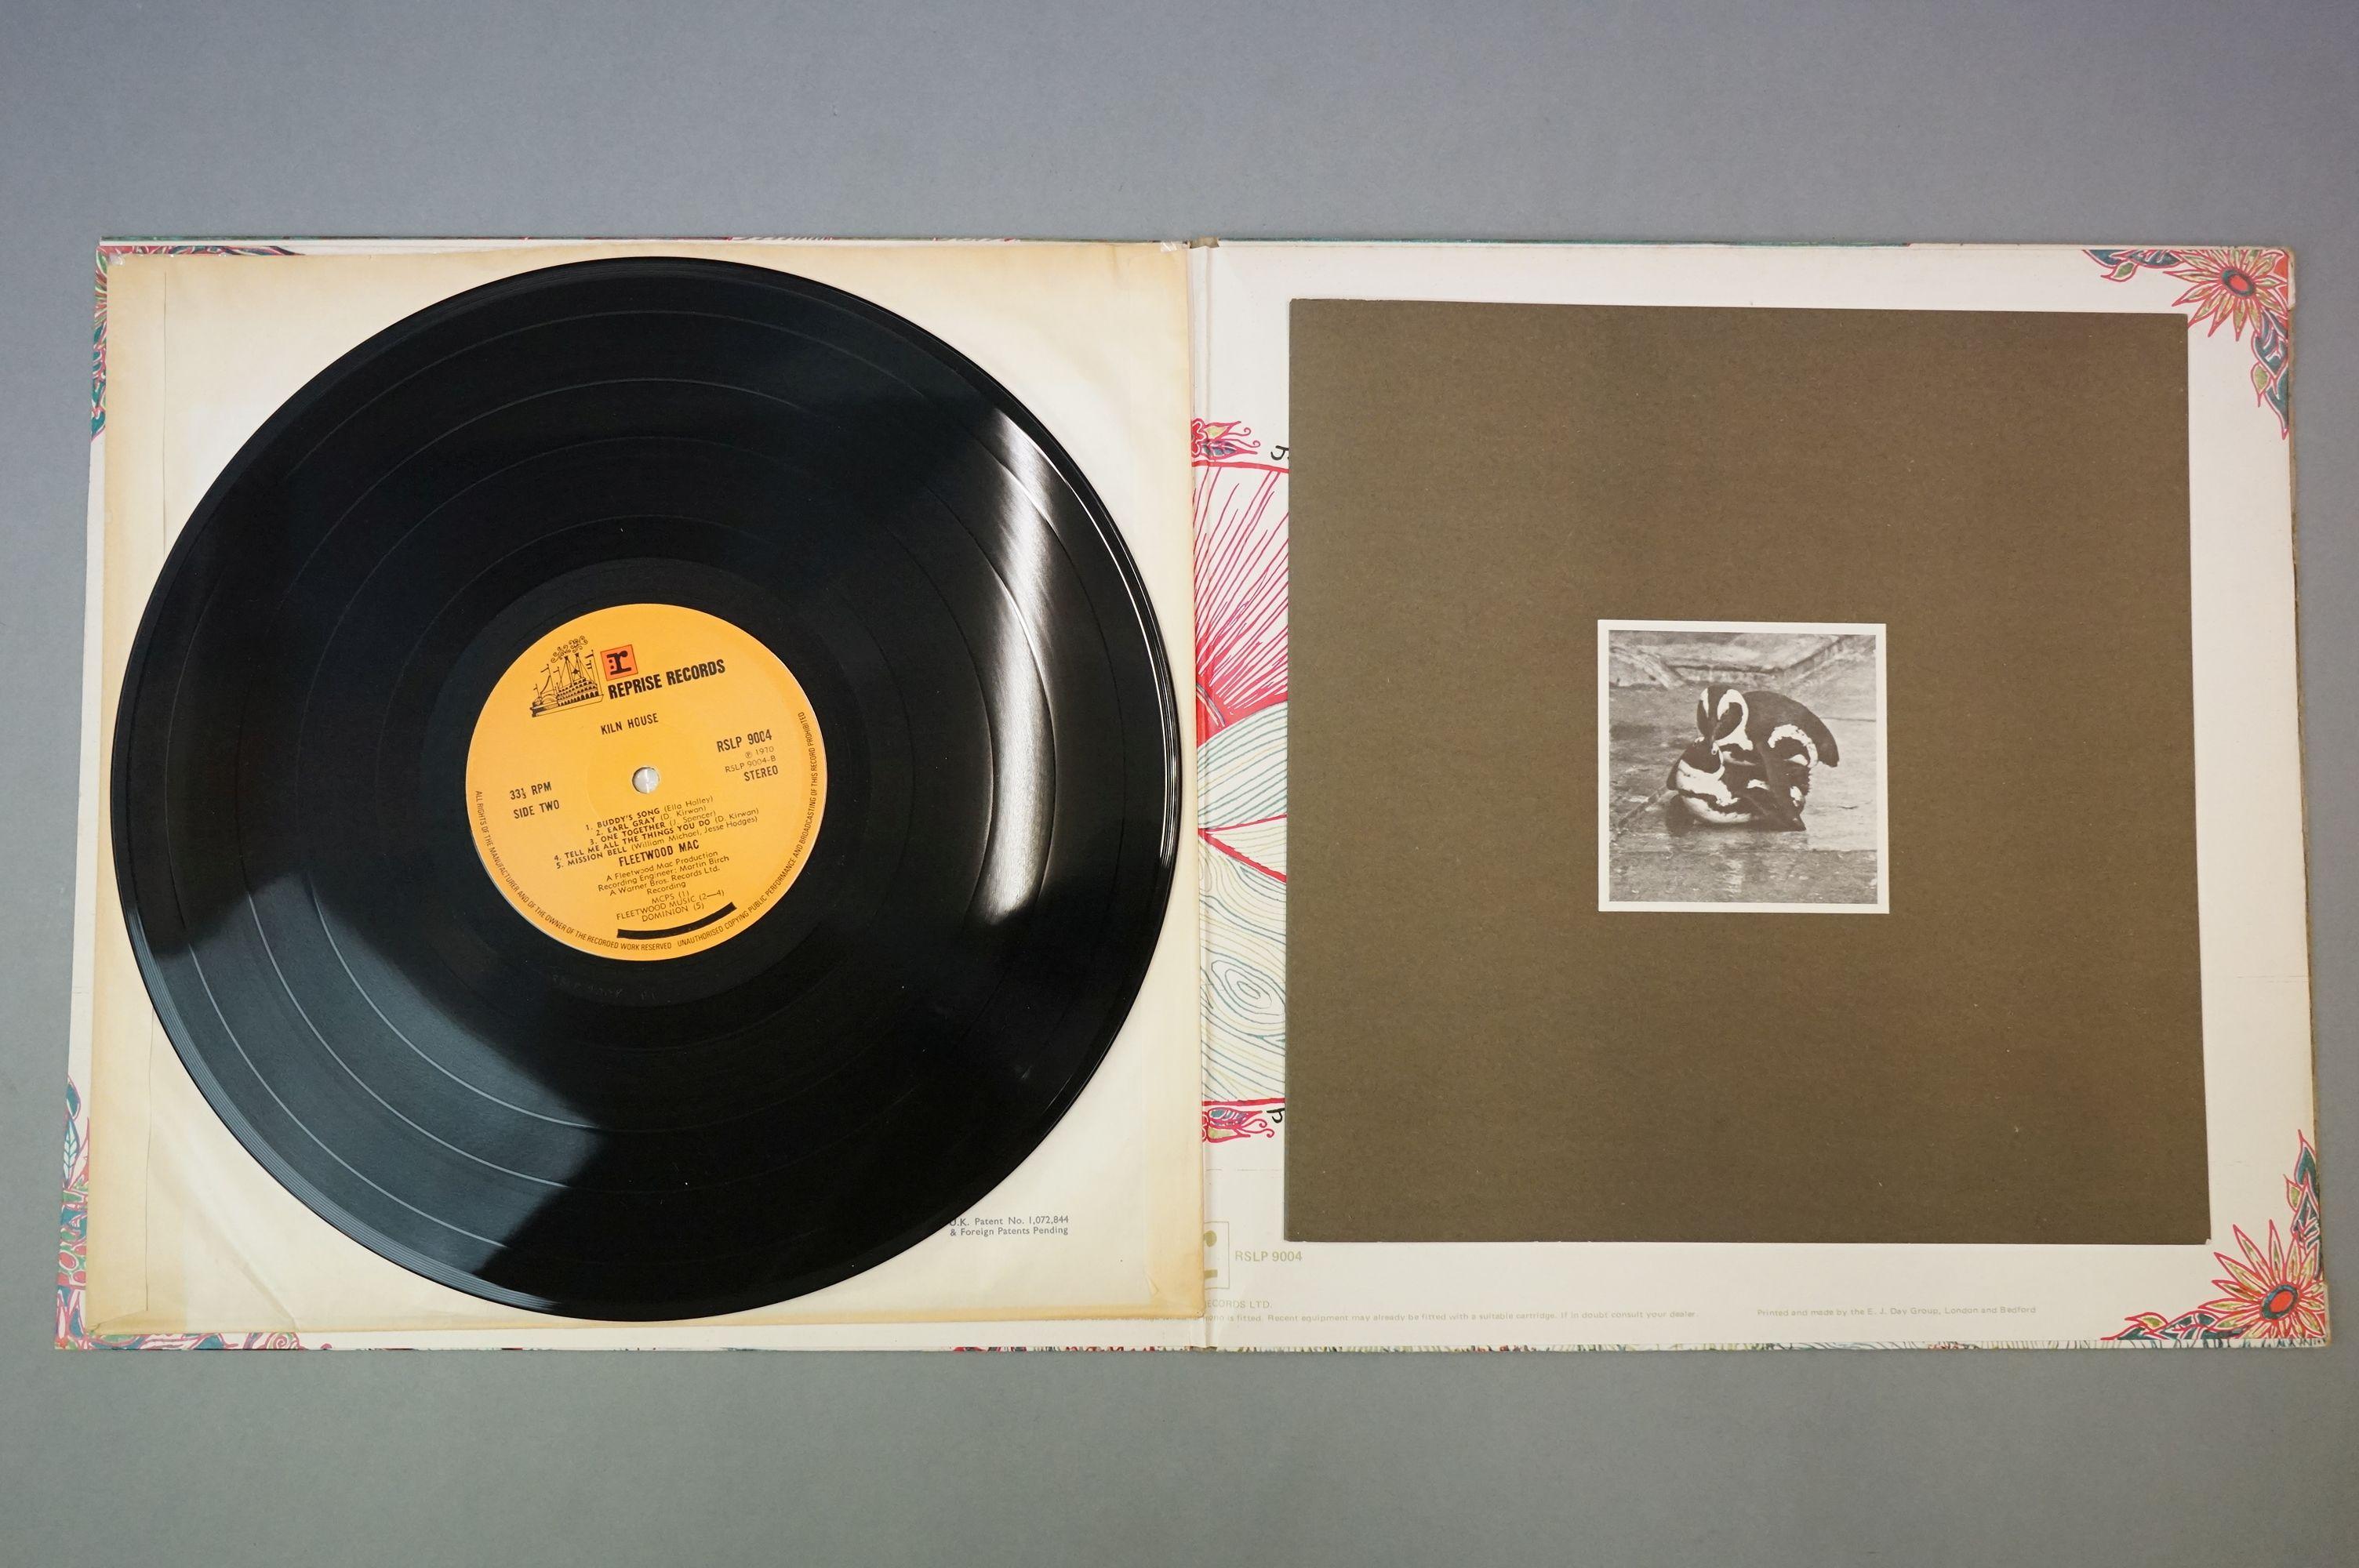 Vinyl - Fleetwood Mac, Kiln House (Reprise RSLP 9004) insert included, sleeve, insert and vinyl vg+ - Image 4 of 14